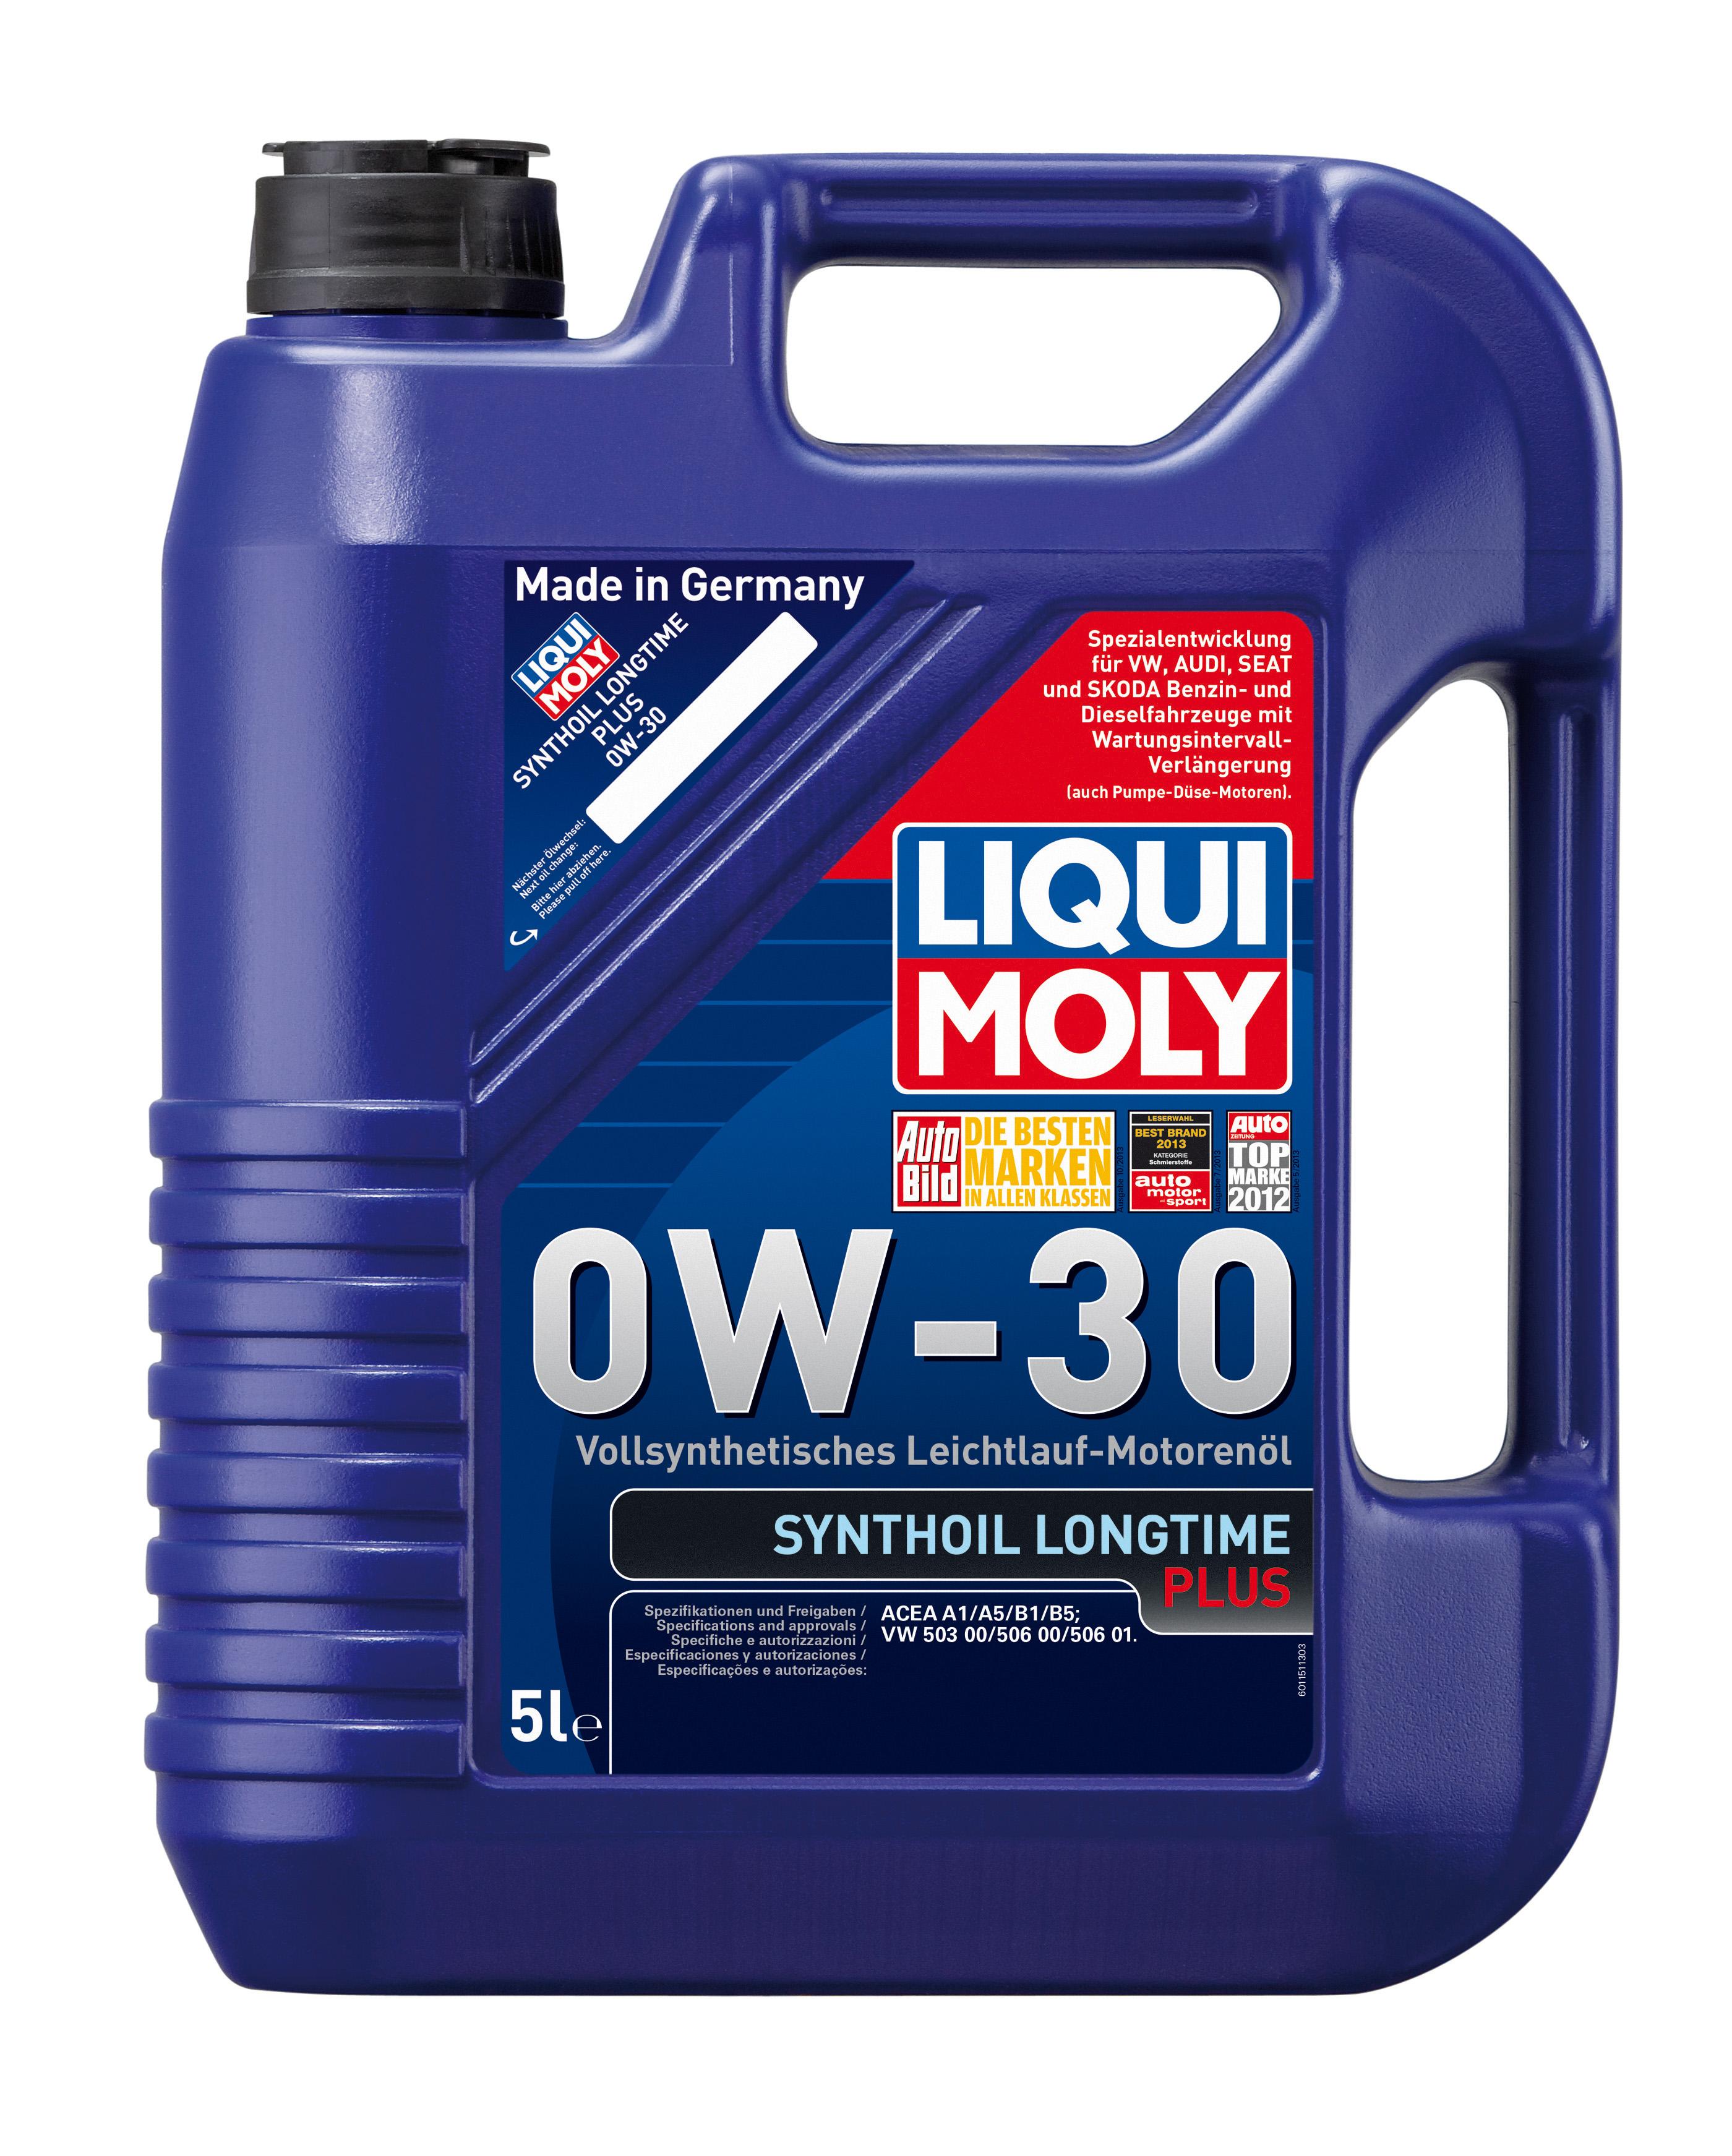 Синтетическое моторное масло Synthoil Longtime Plus 0W-30